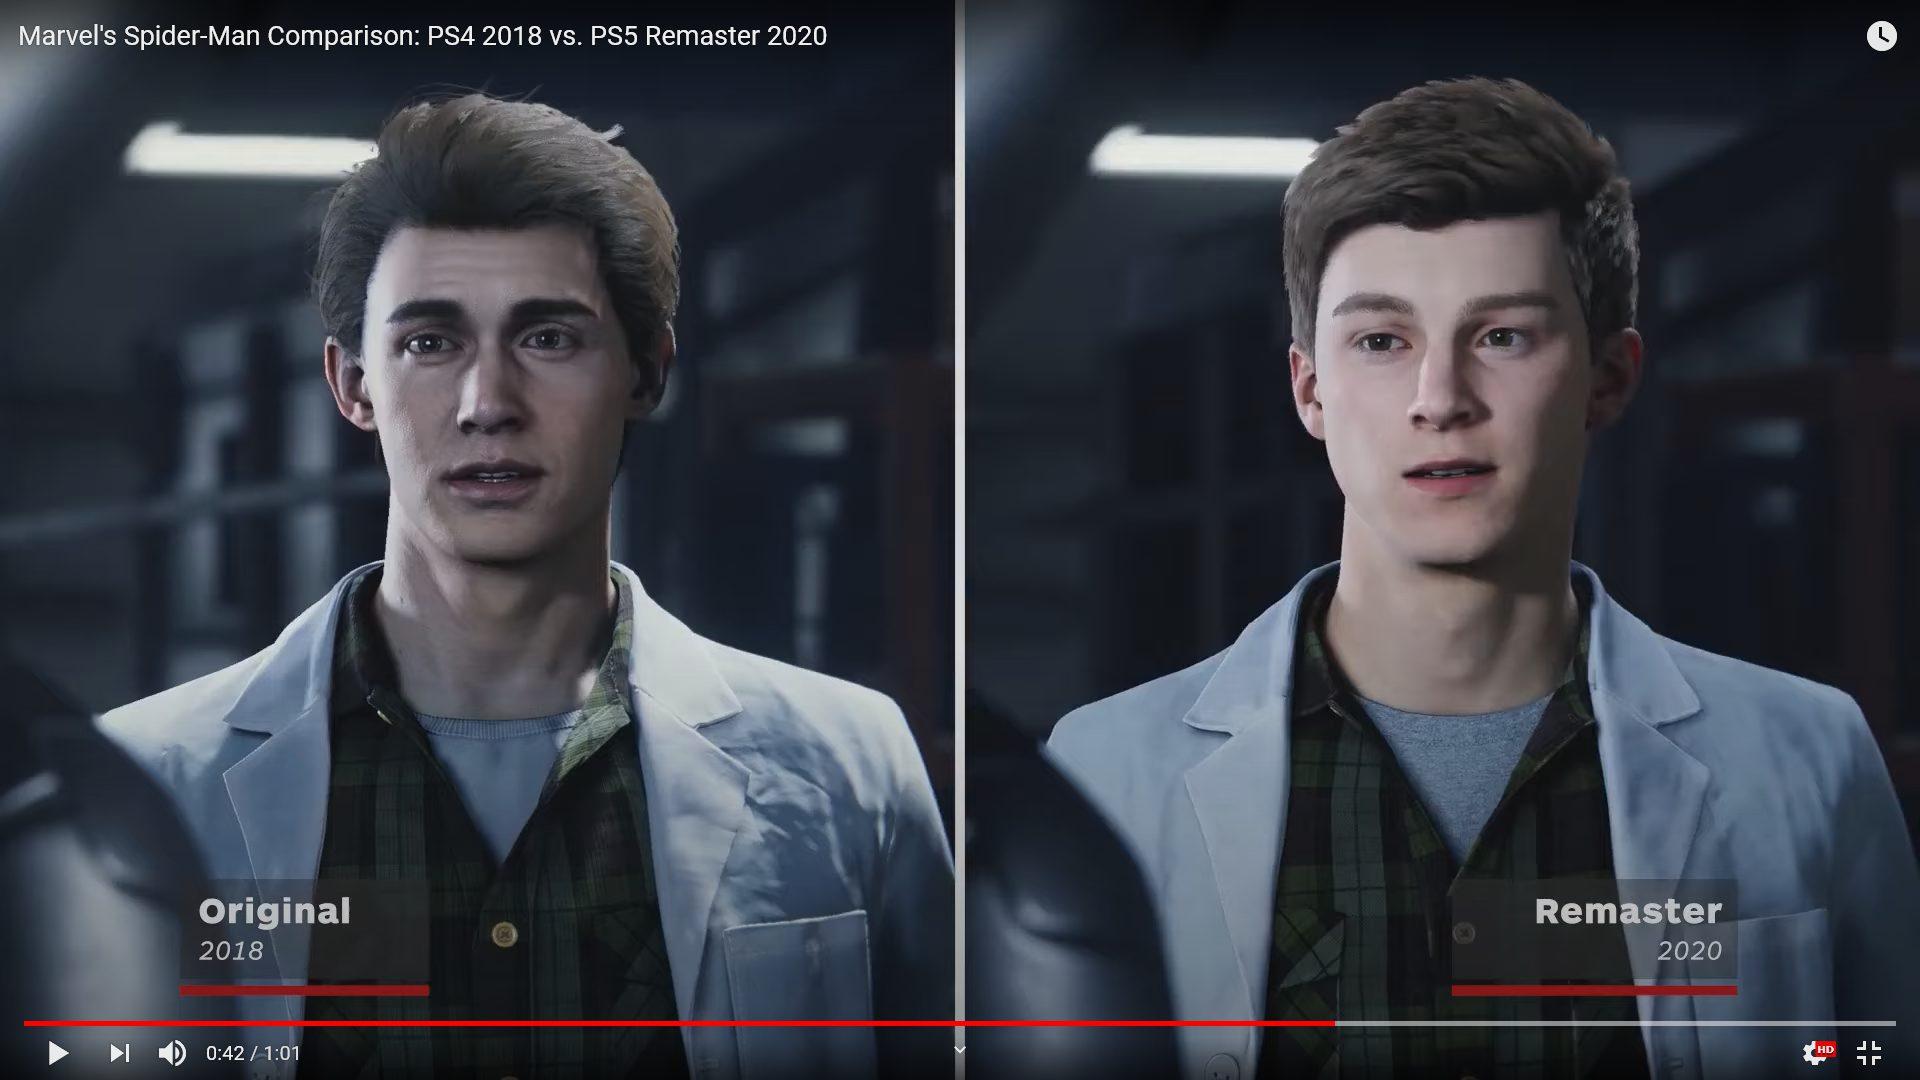 3VqMDGb 1 - PS5スパイダーマン、主人公ピーターの顔が変わって炎上中